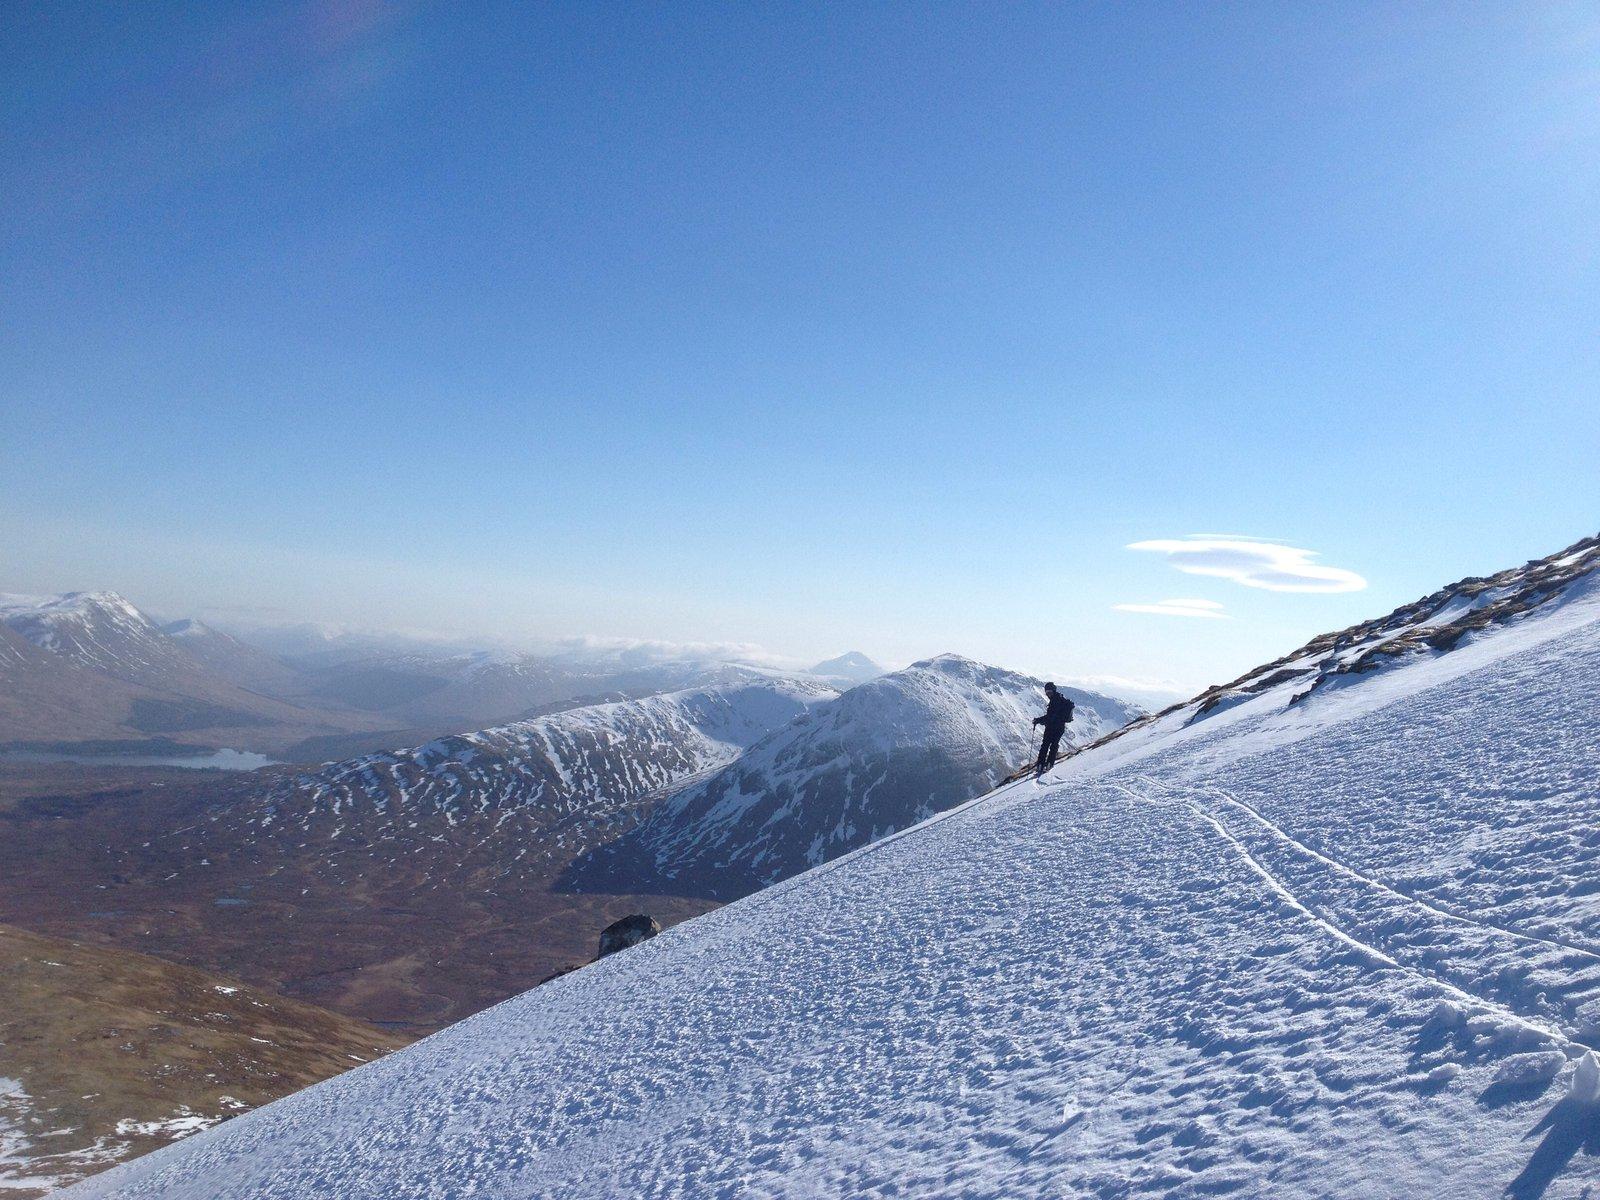 Spring Skiing in the UK